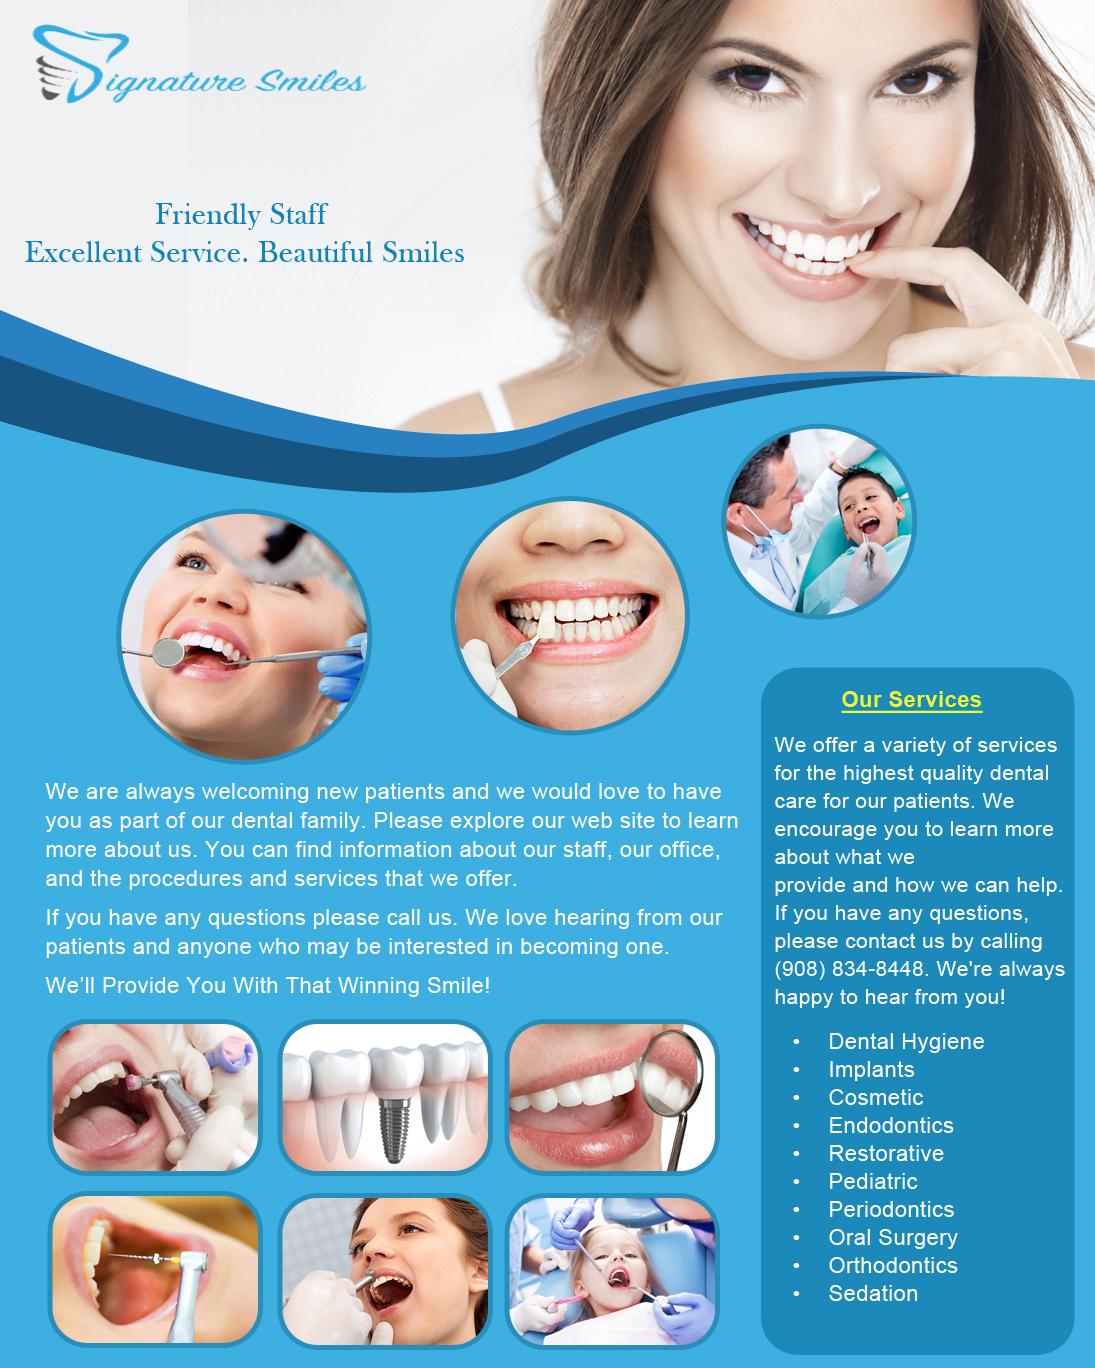 Signature Smiles At Edison Dentist In Edison Nj Sulekha